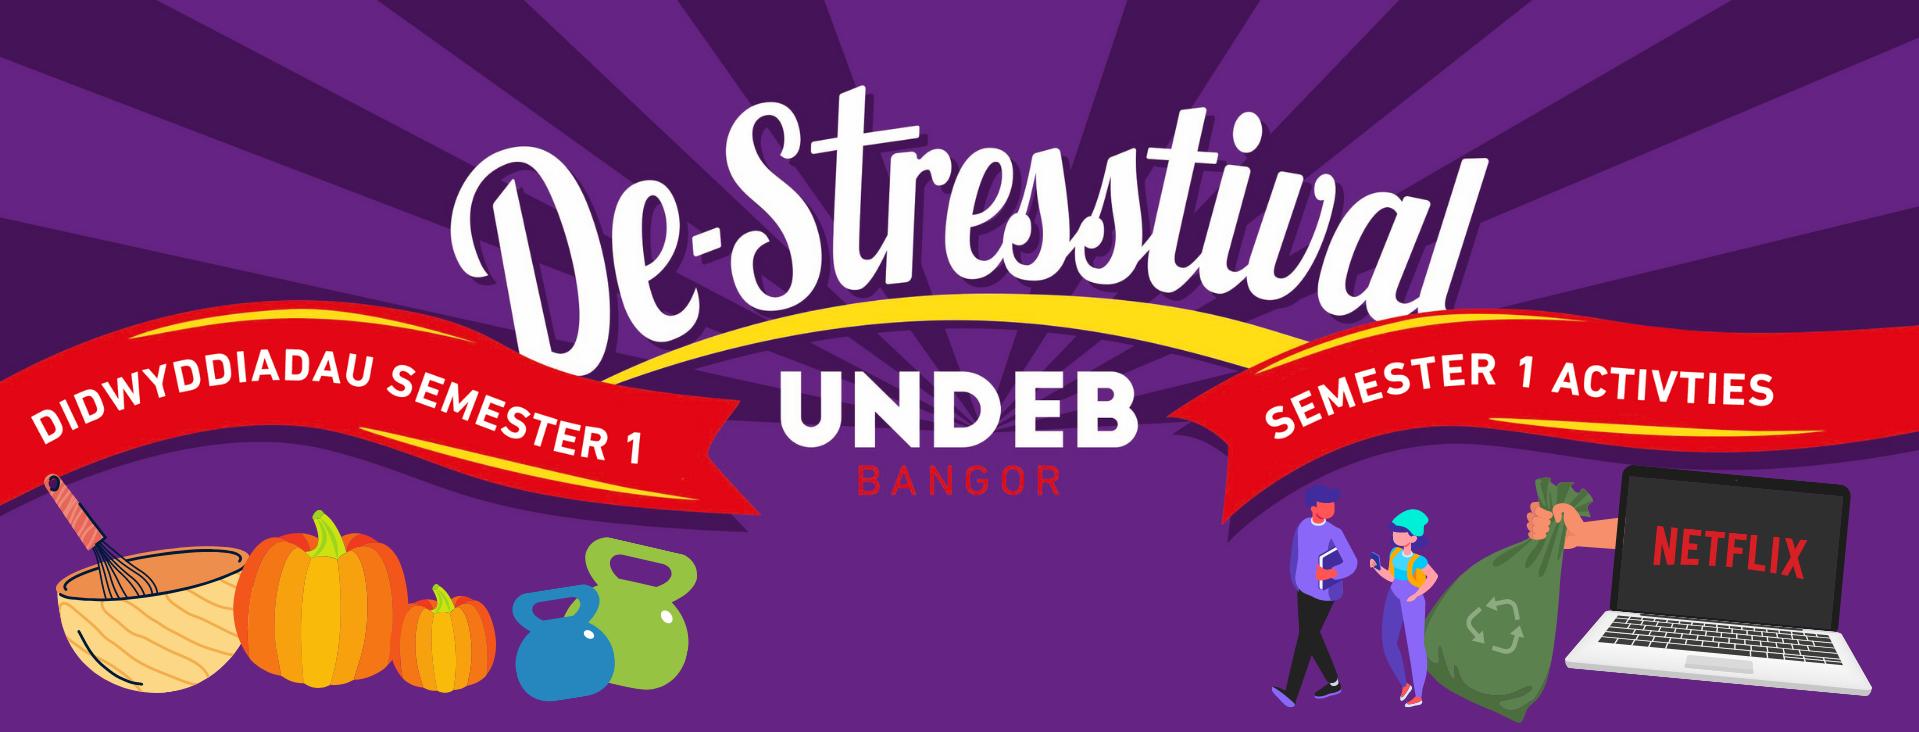 Destresstival semester 1 2020 web banner